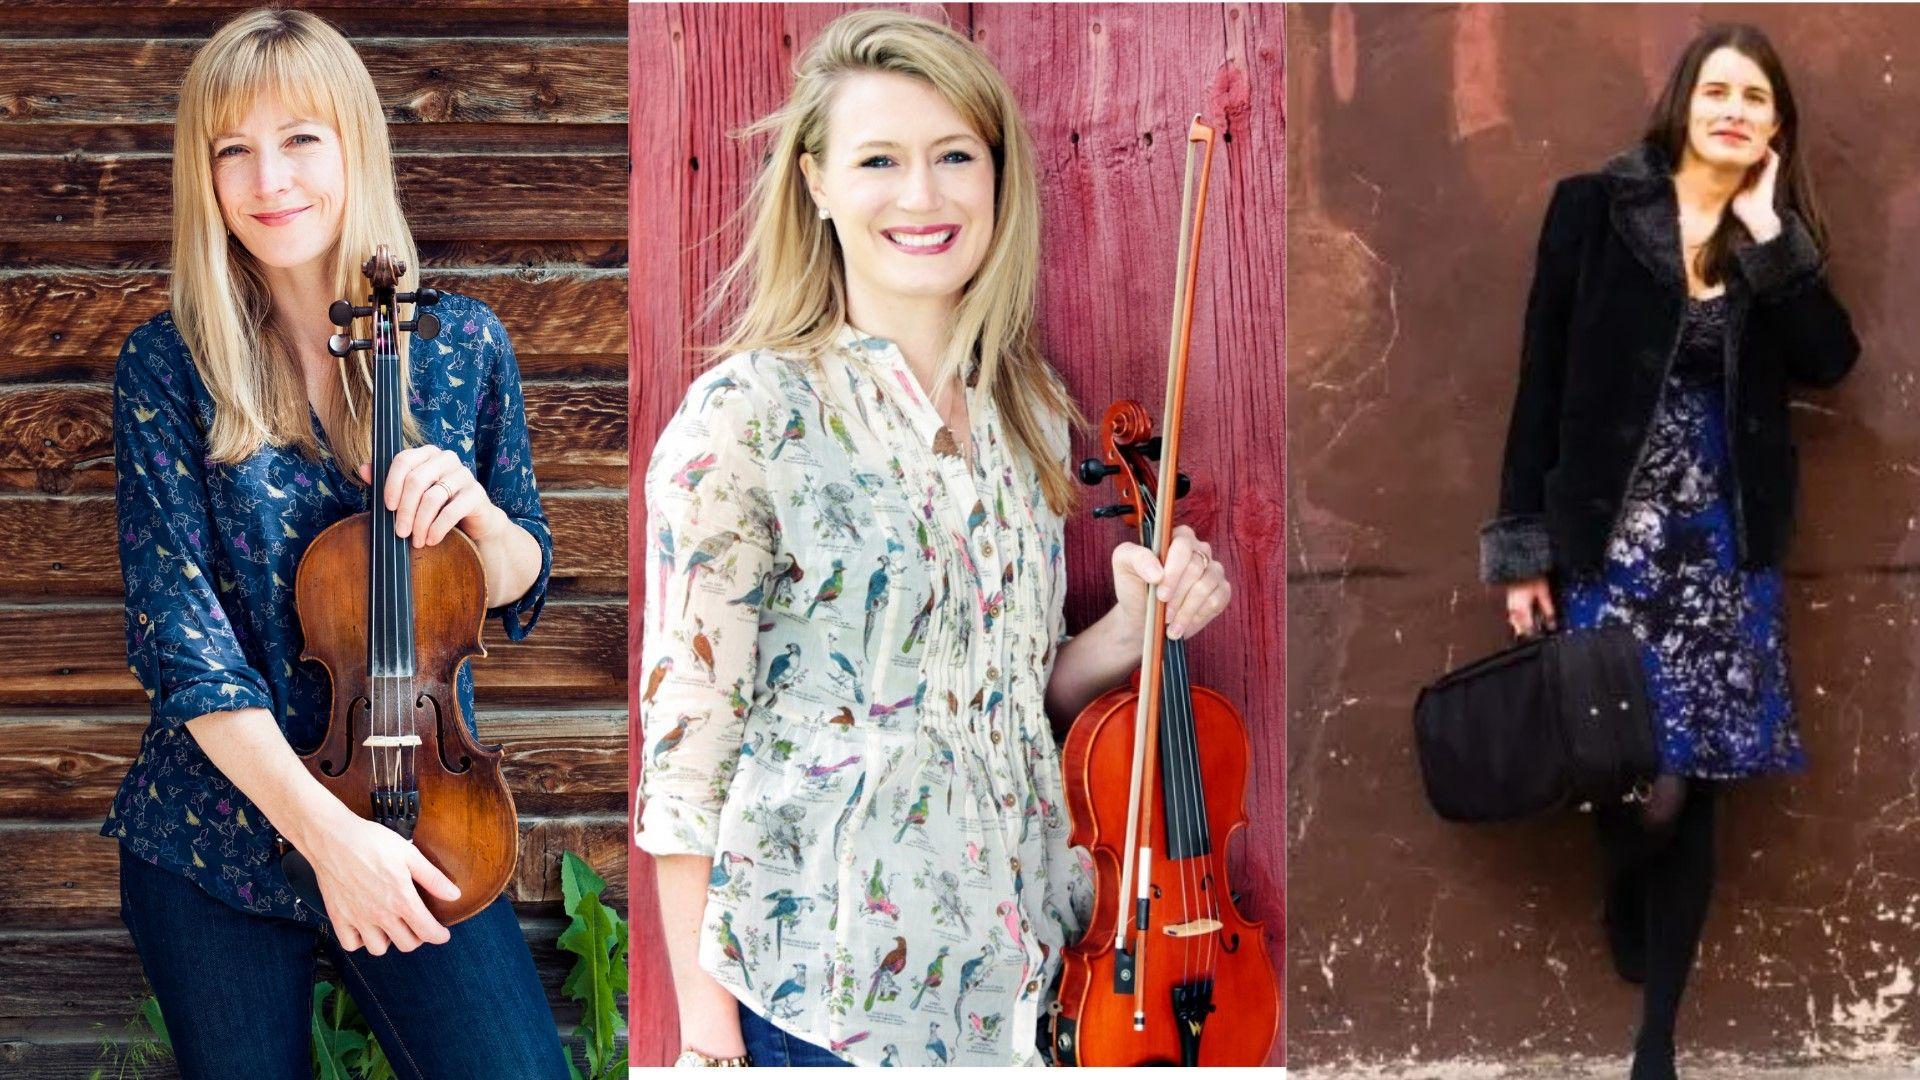 The Bow Tides featuring Katie Grennan, Jessie Burns, and Ellery Klein